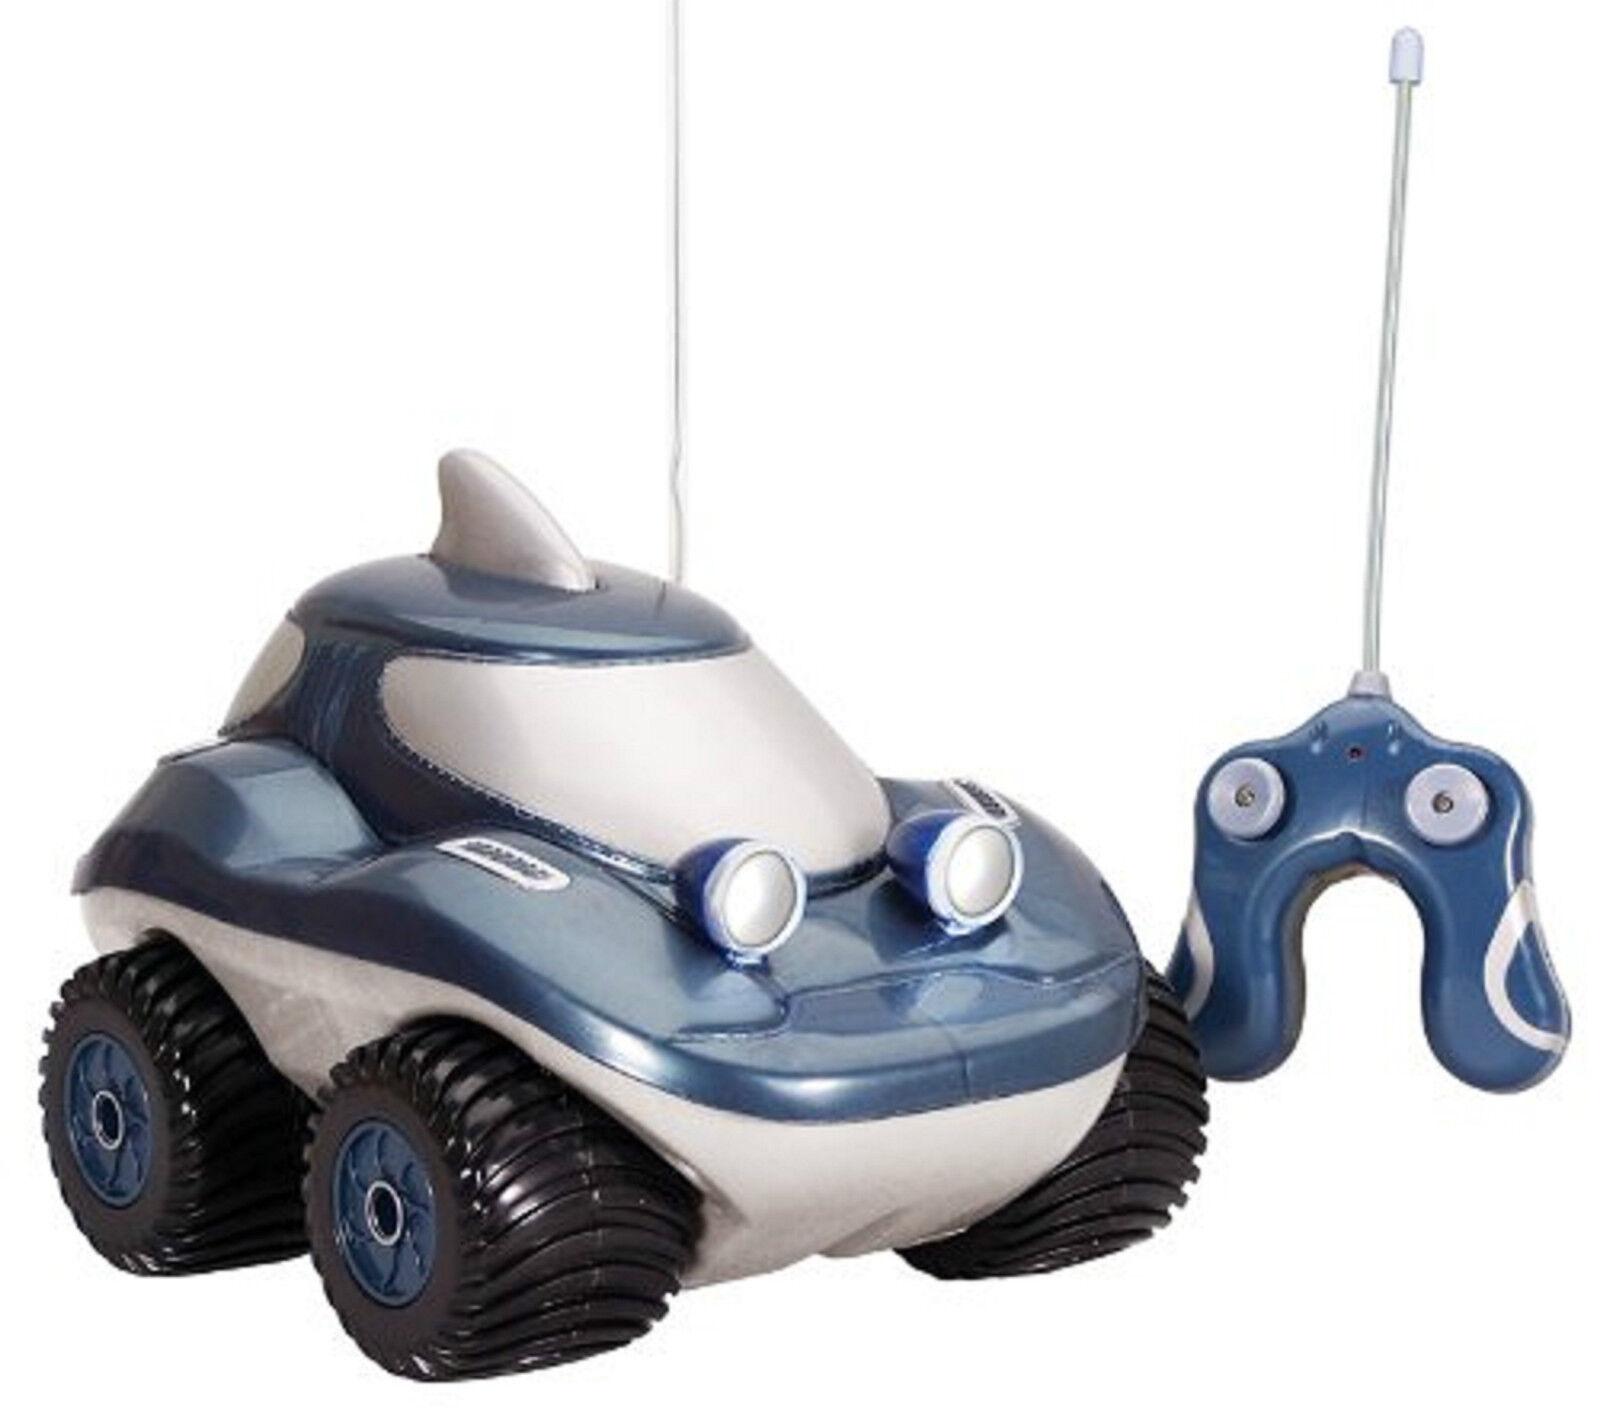 Radio Remote Control Car Kid Galaxy Shark Speed Boat 4x4 Ages 2+ Water Boys Play